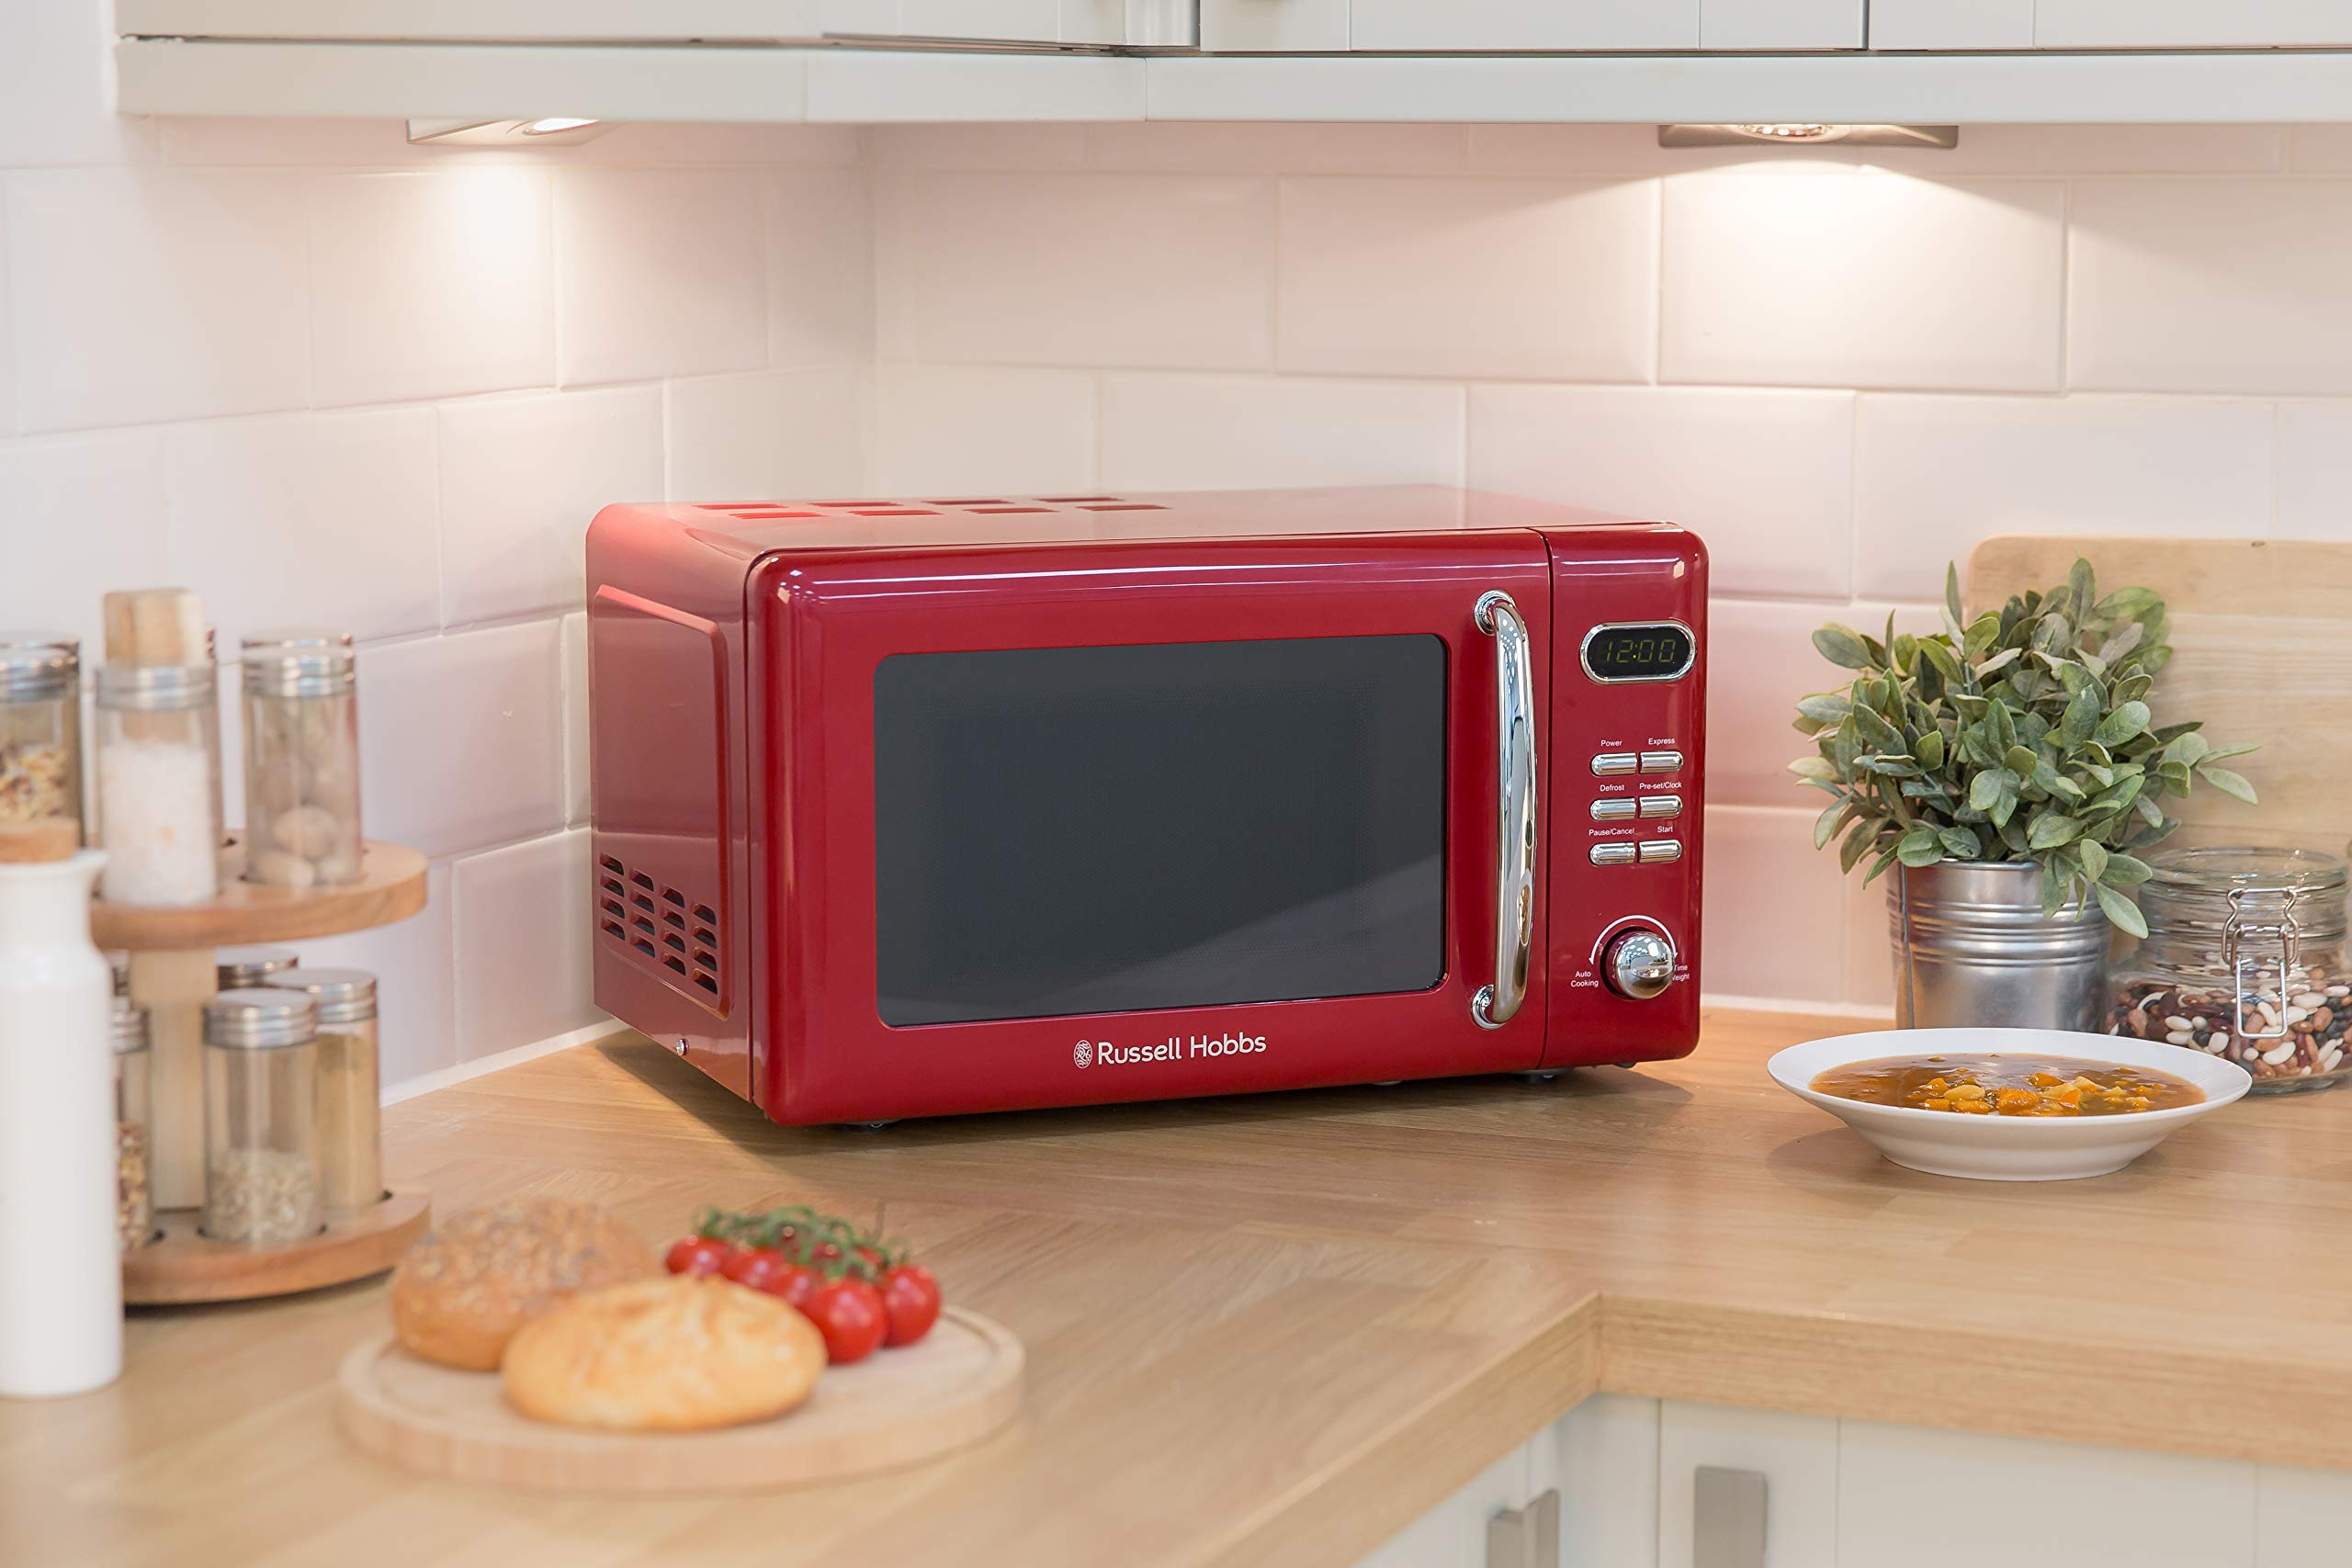 71IZ3brwhdL - Russell Hobbs RHRETMD806R Solo Microwave, Red, 17 liters